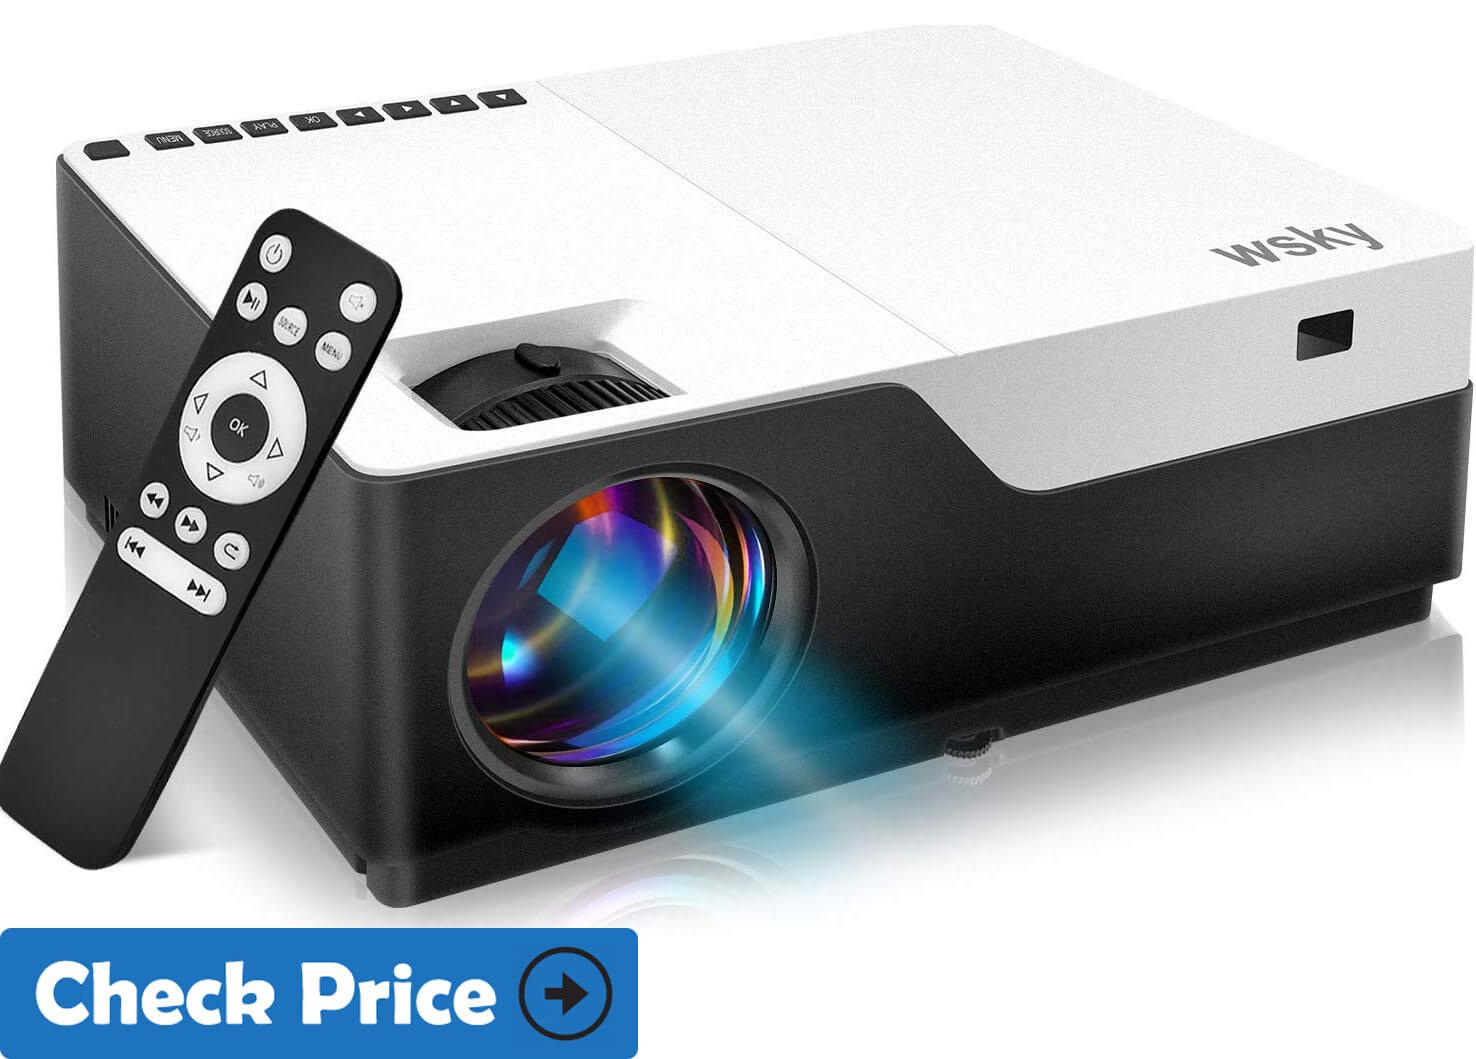 Wsky 1080P Projector under 300